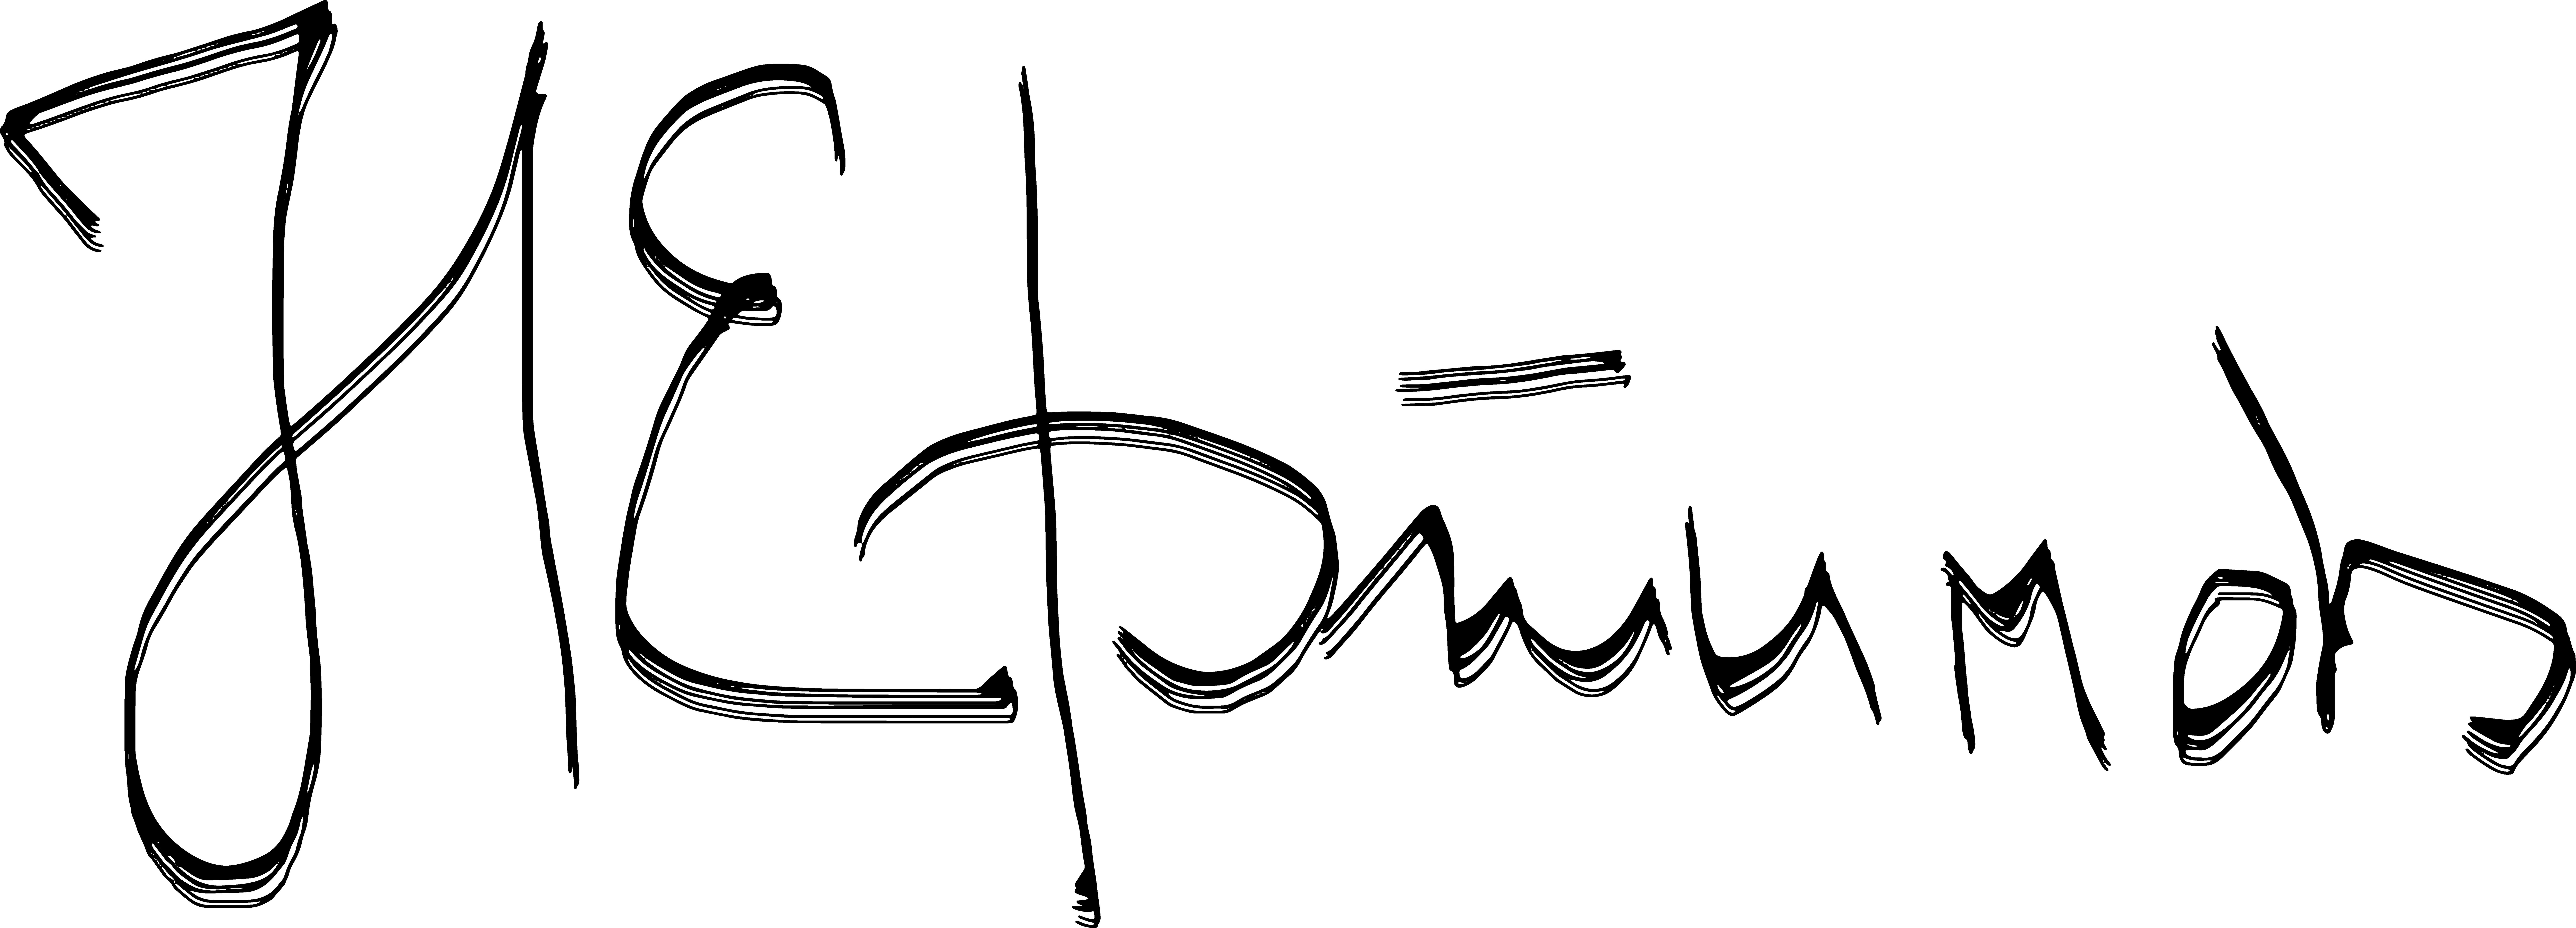 Nikola Eftimov's Signature